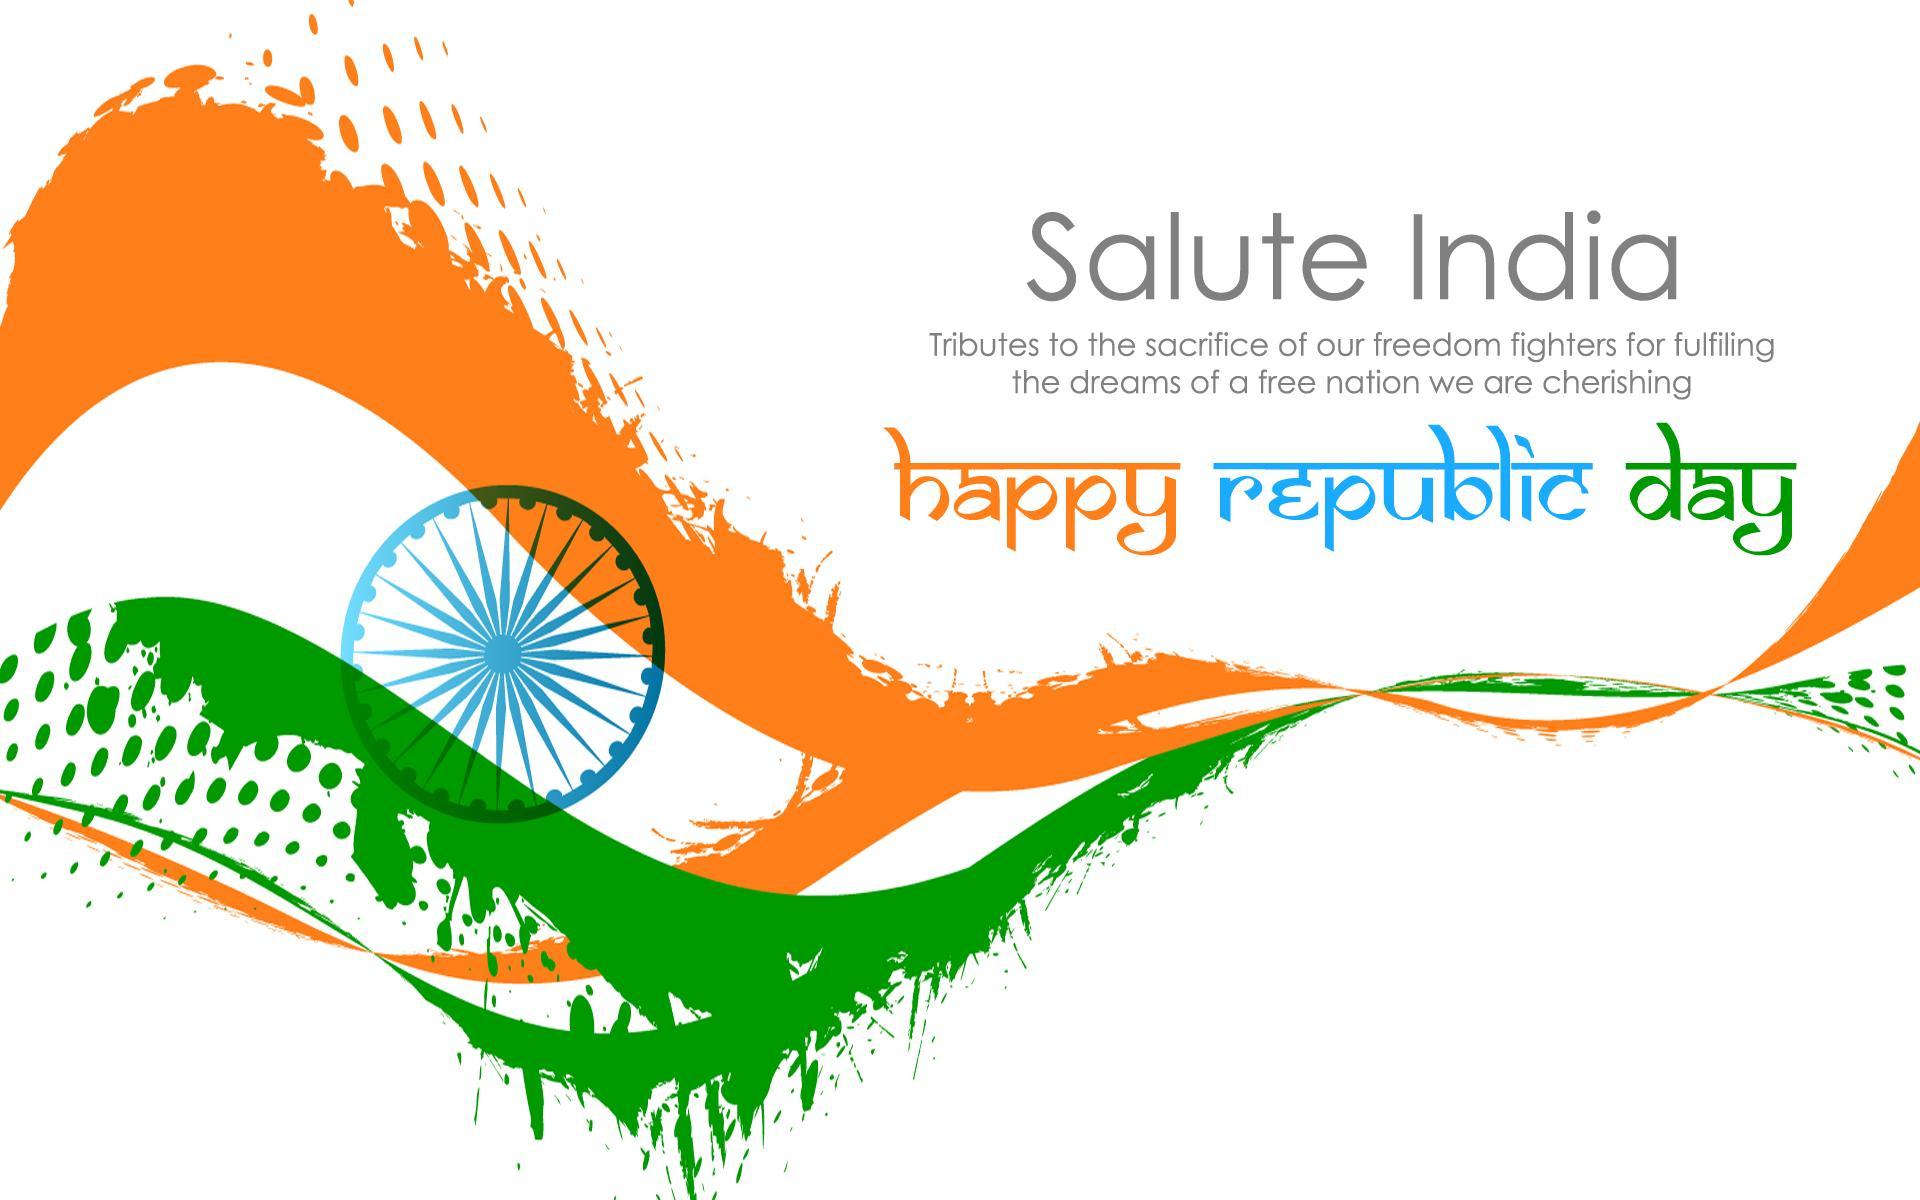 India Hd Wallpapers 1080p 1080p Indian Flag Hd 1920x1200 Wallpaper Teahub Io